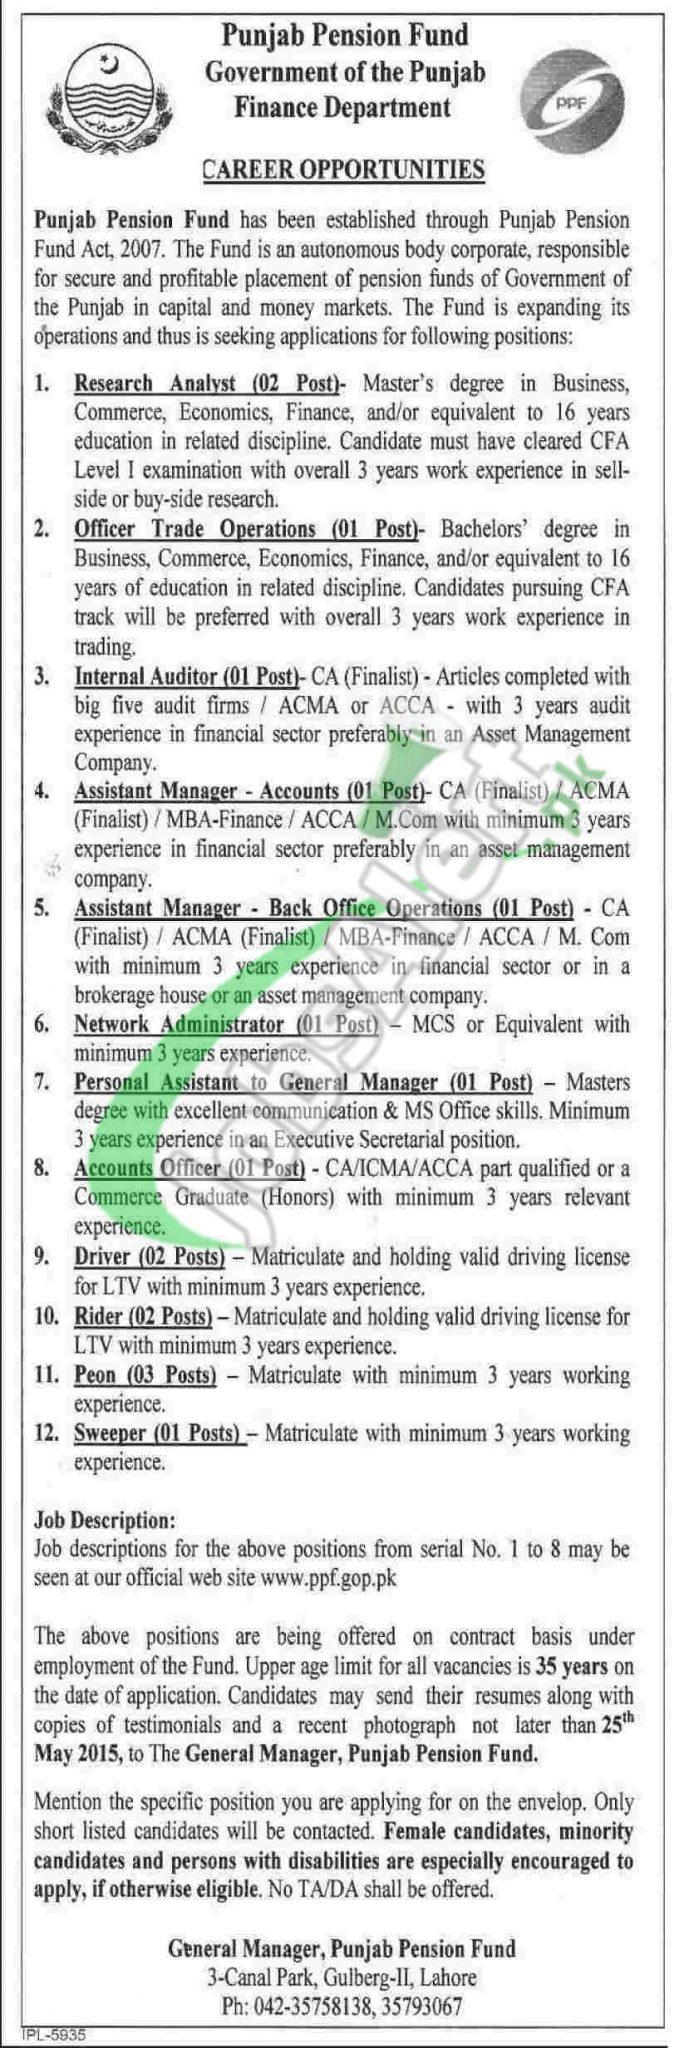 Jobs in Finance Department Punjab